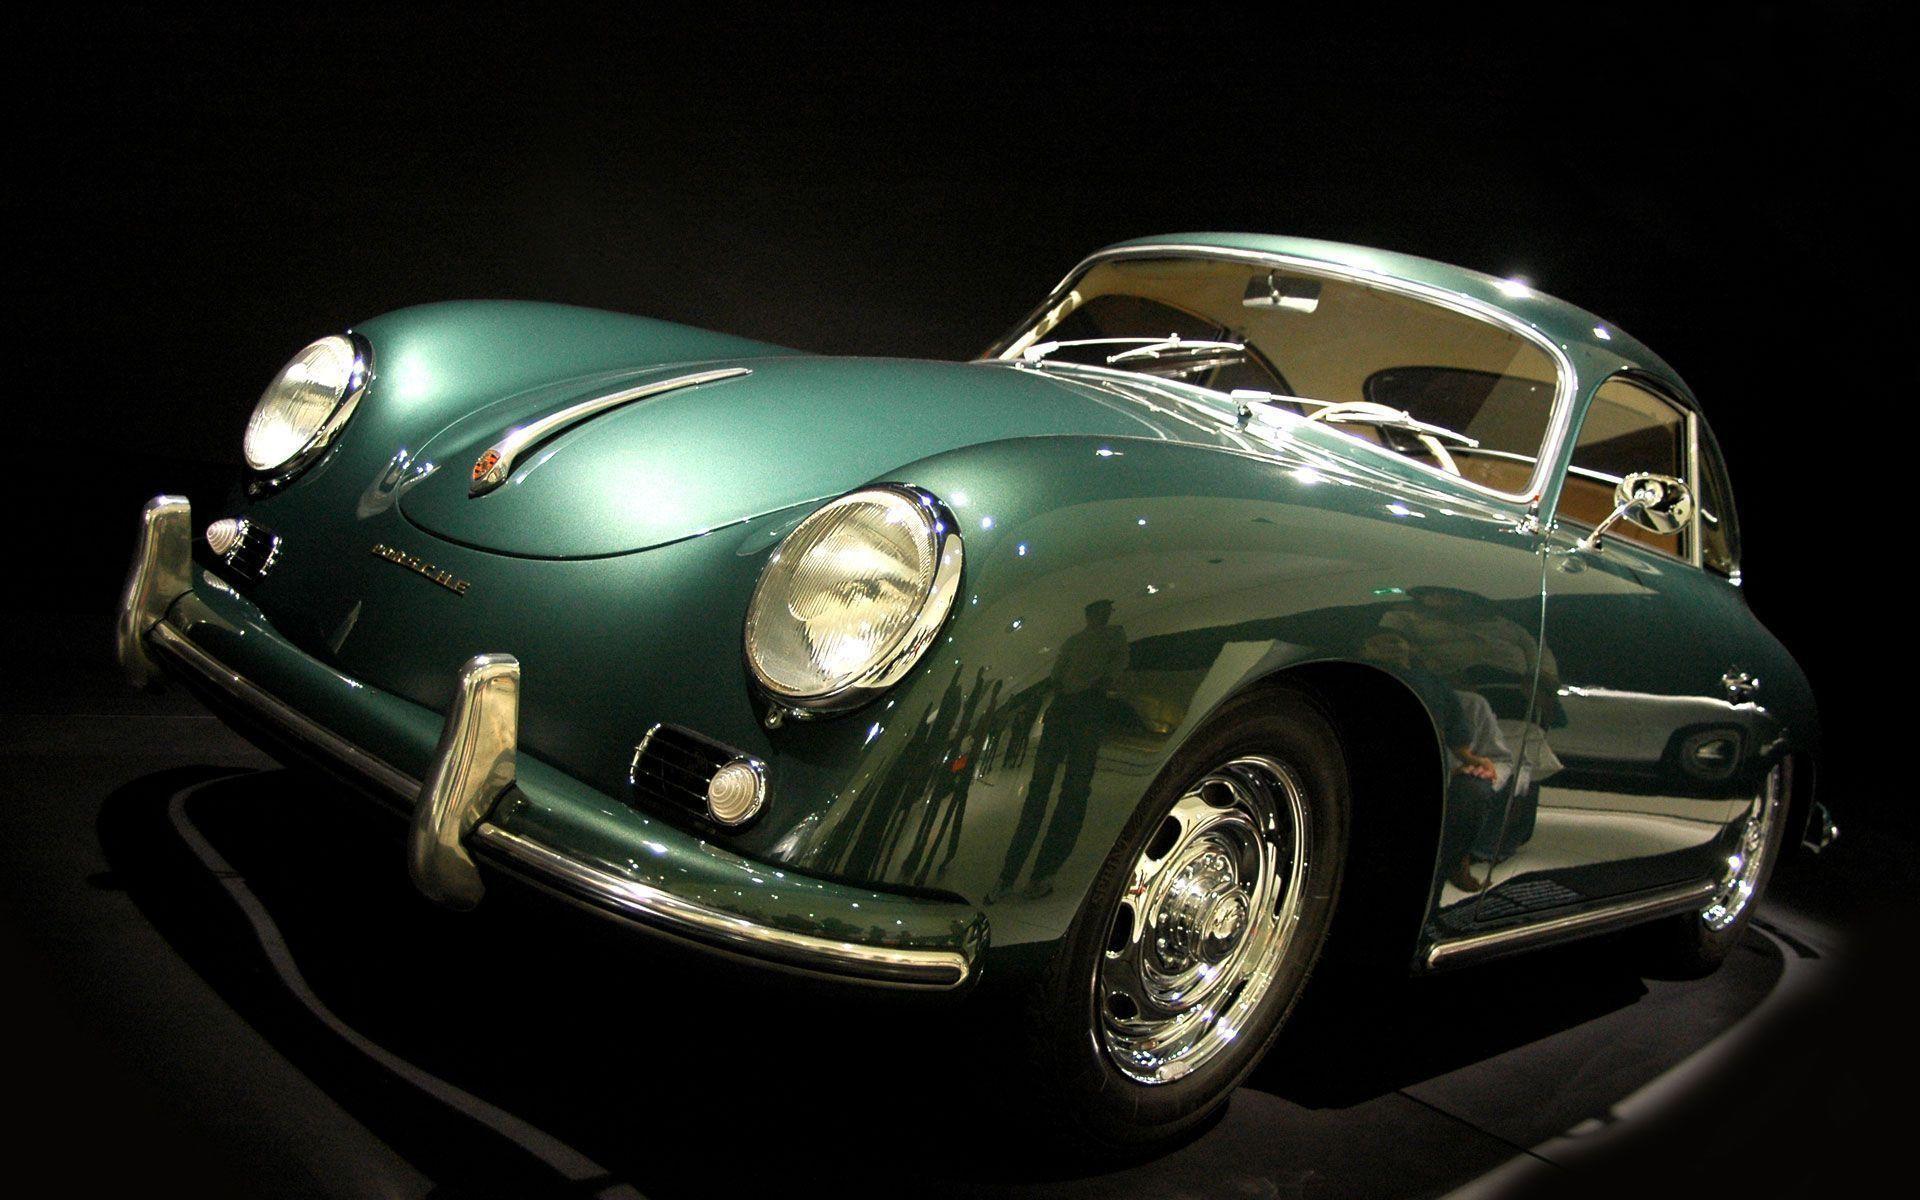 1956 Porsche 356 A 1600 Super Coupe Free Desktop Wallpapers Porsche 356 Porsche Old Cars